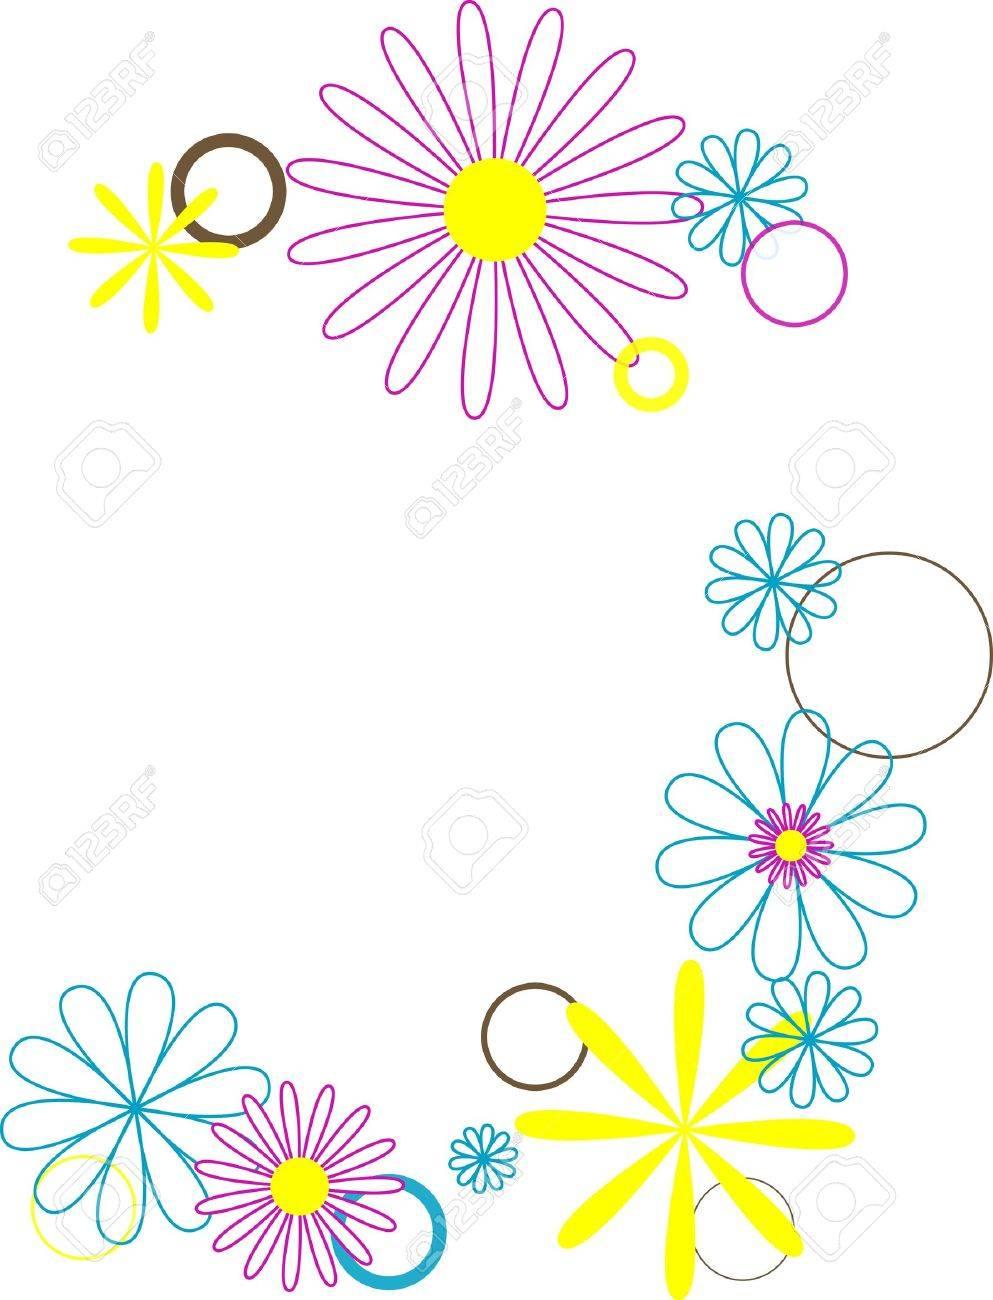 retro flowers and circles Stock Photo - 320300